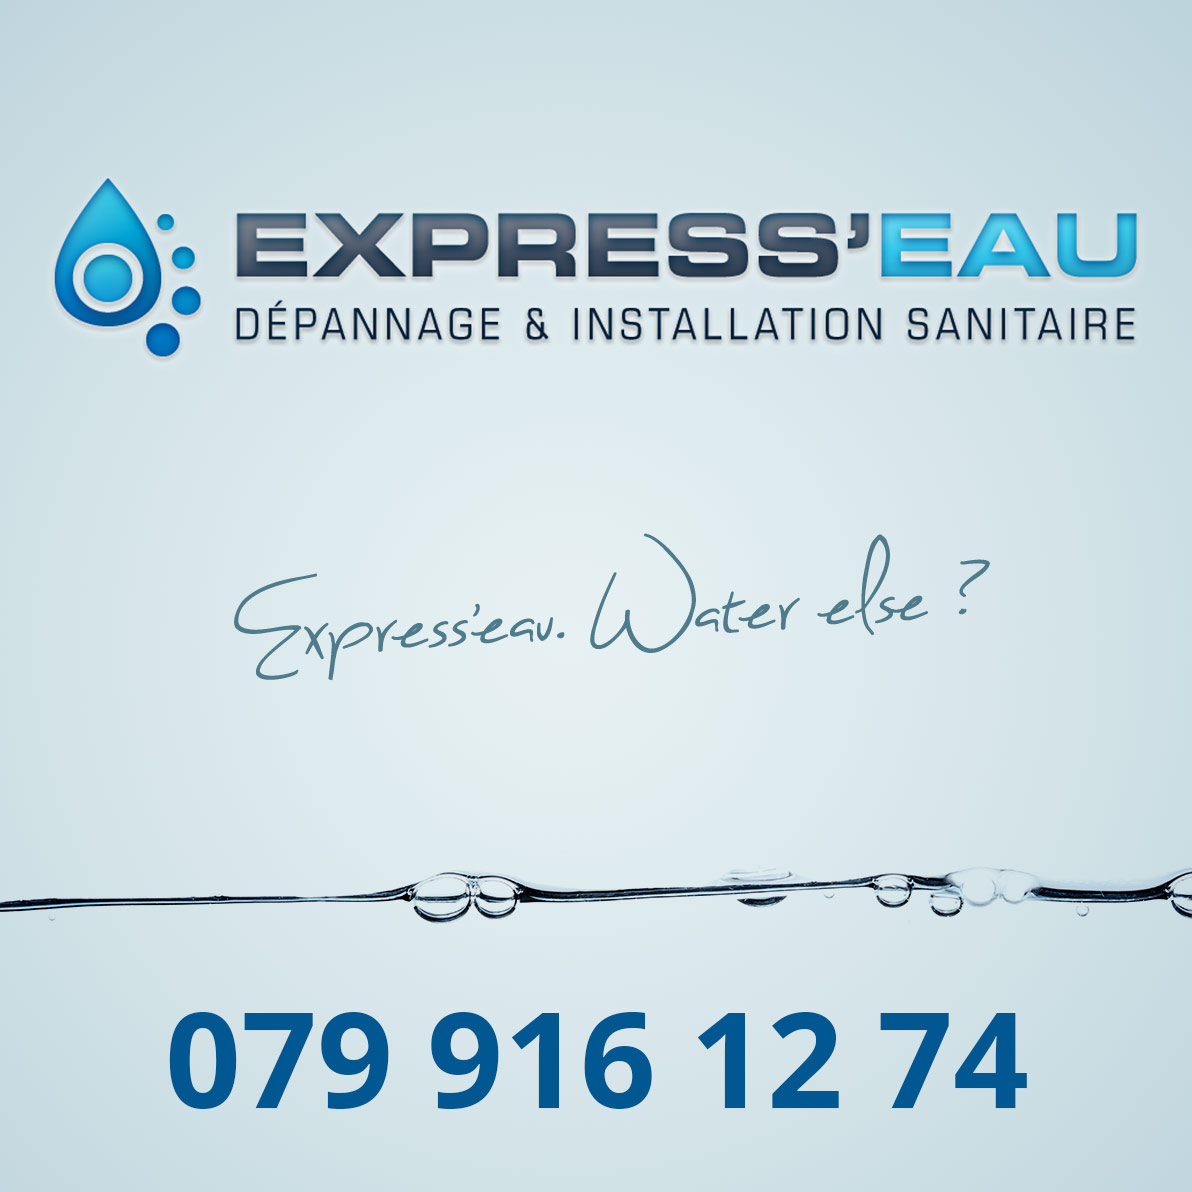 Installation sanitaire geneve